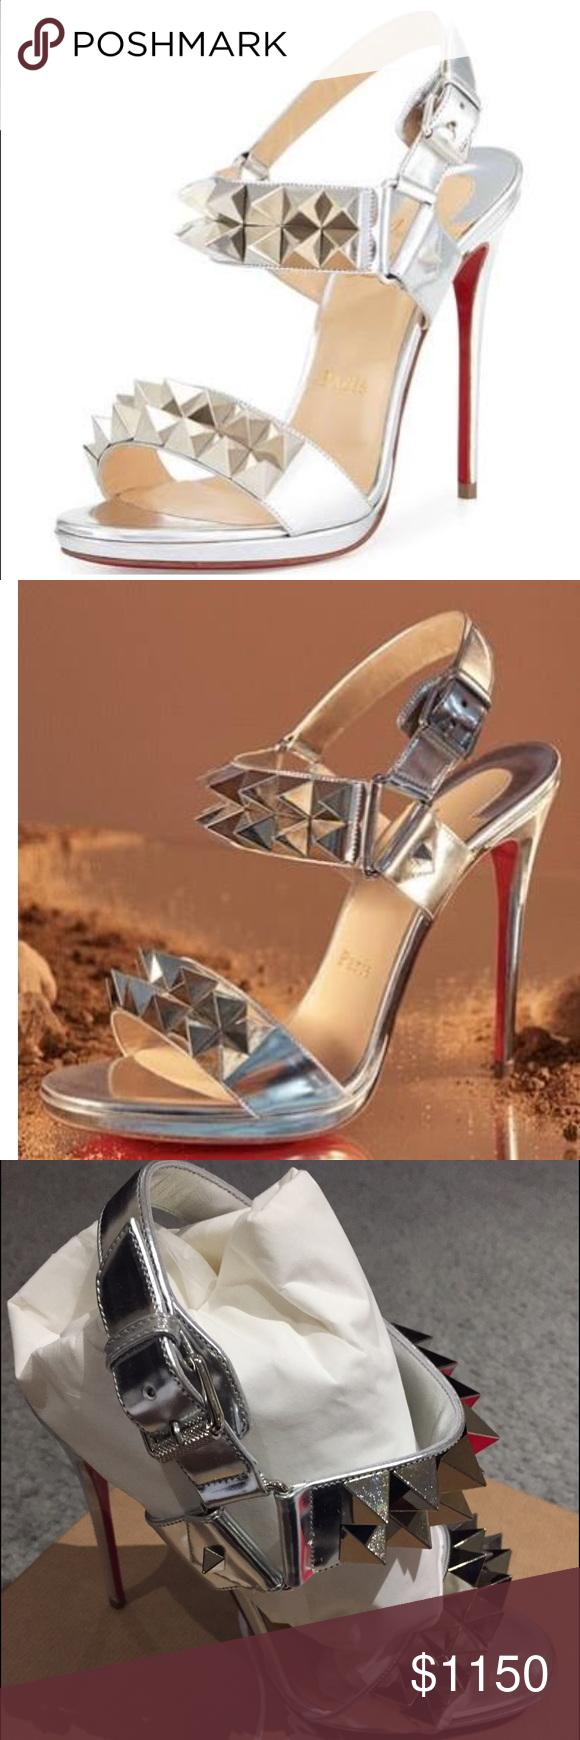 7e374e6fa13 Miziggoo Spiked Two-Band Red Sole Sandal, Silver BRAND NEW ...